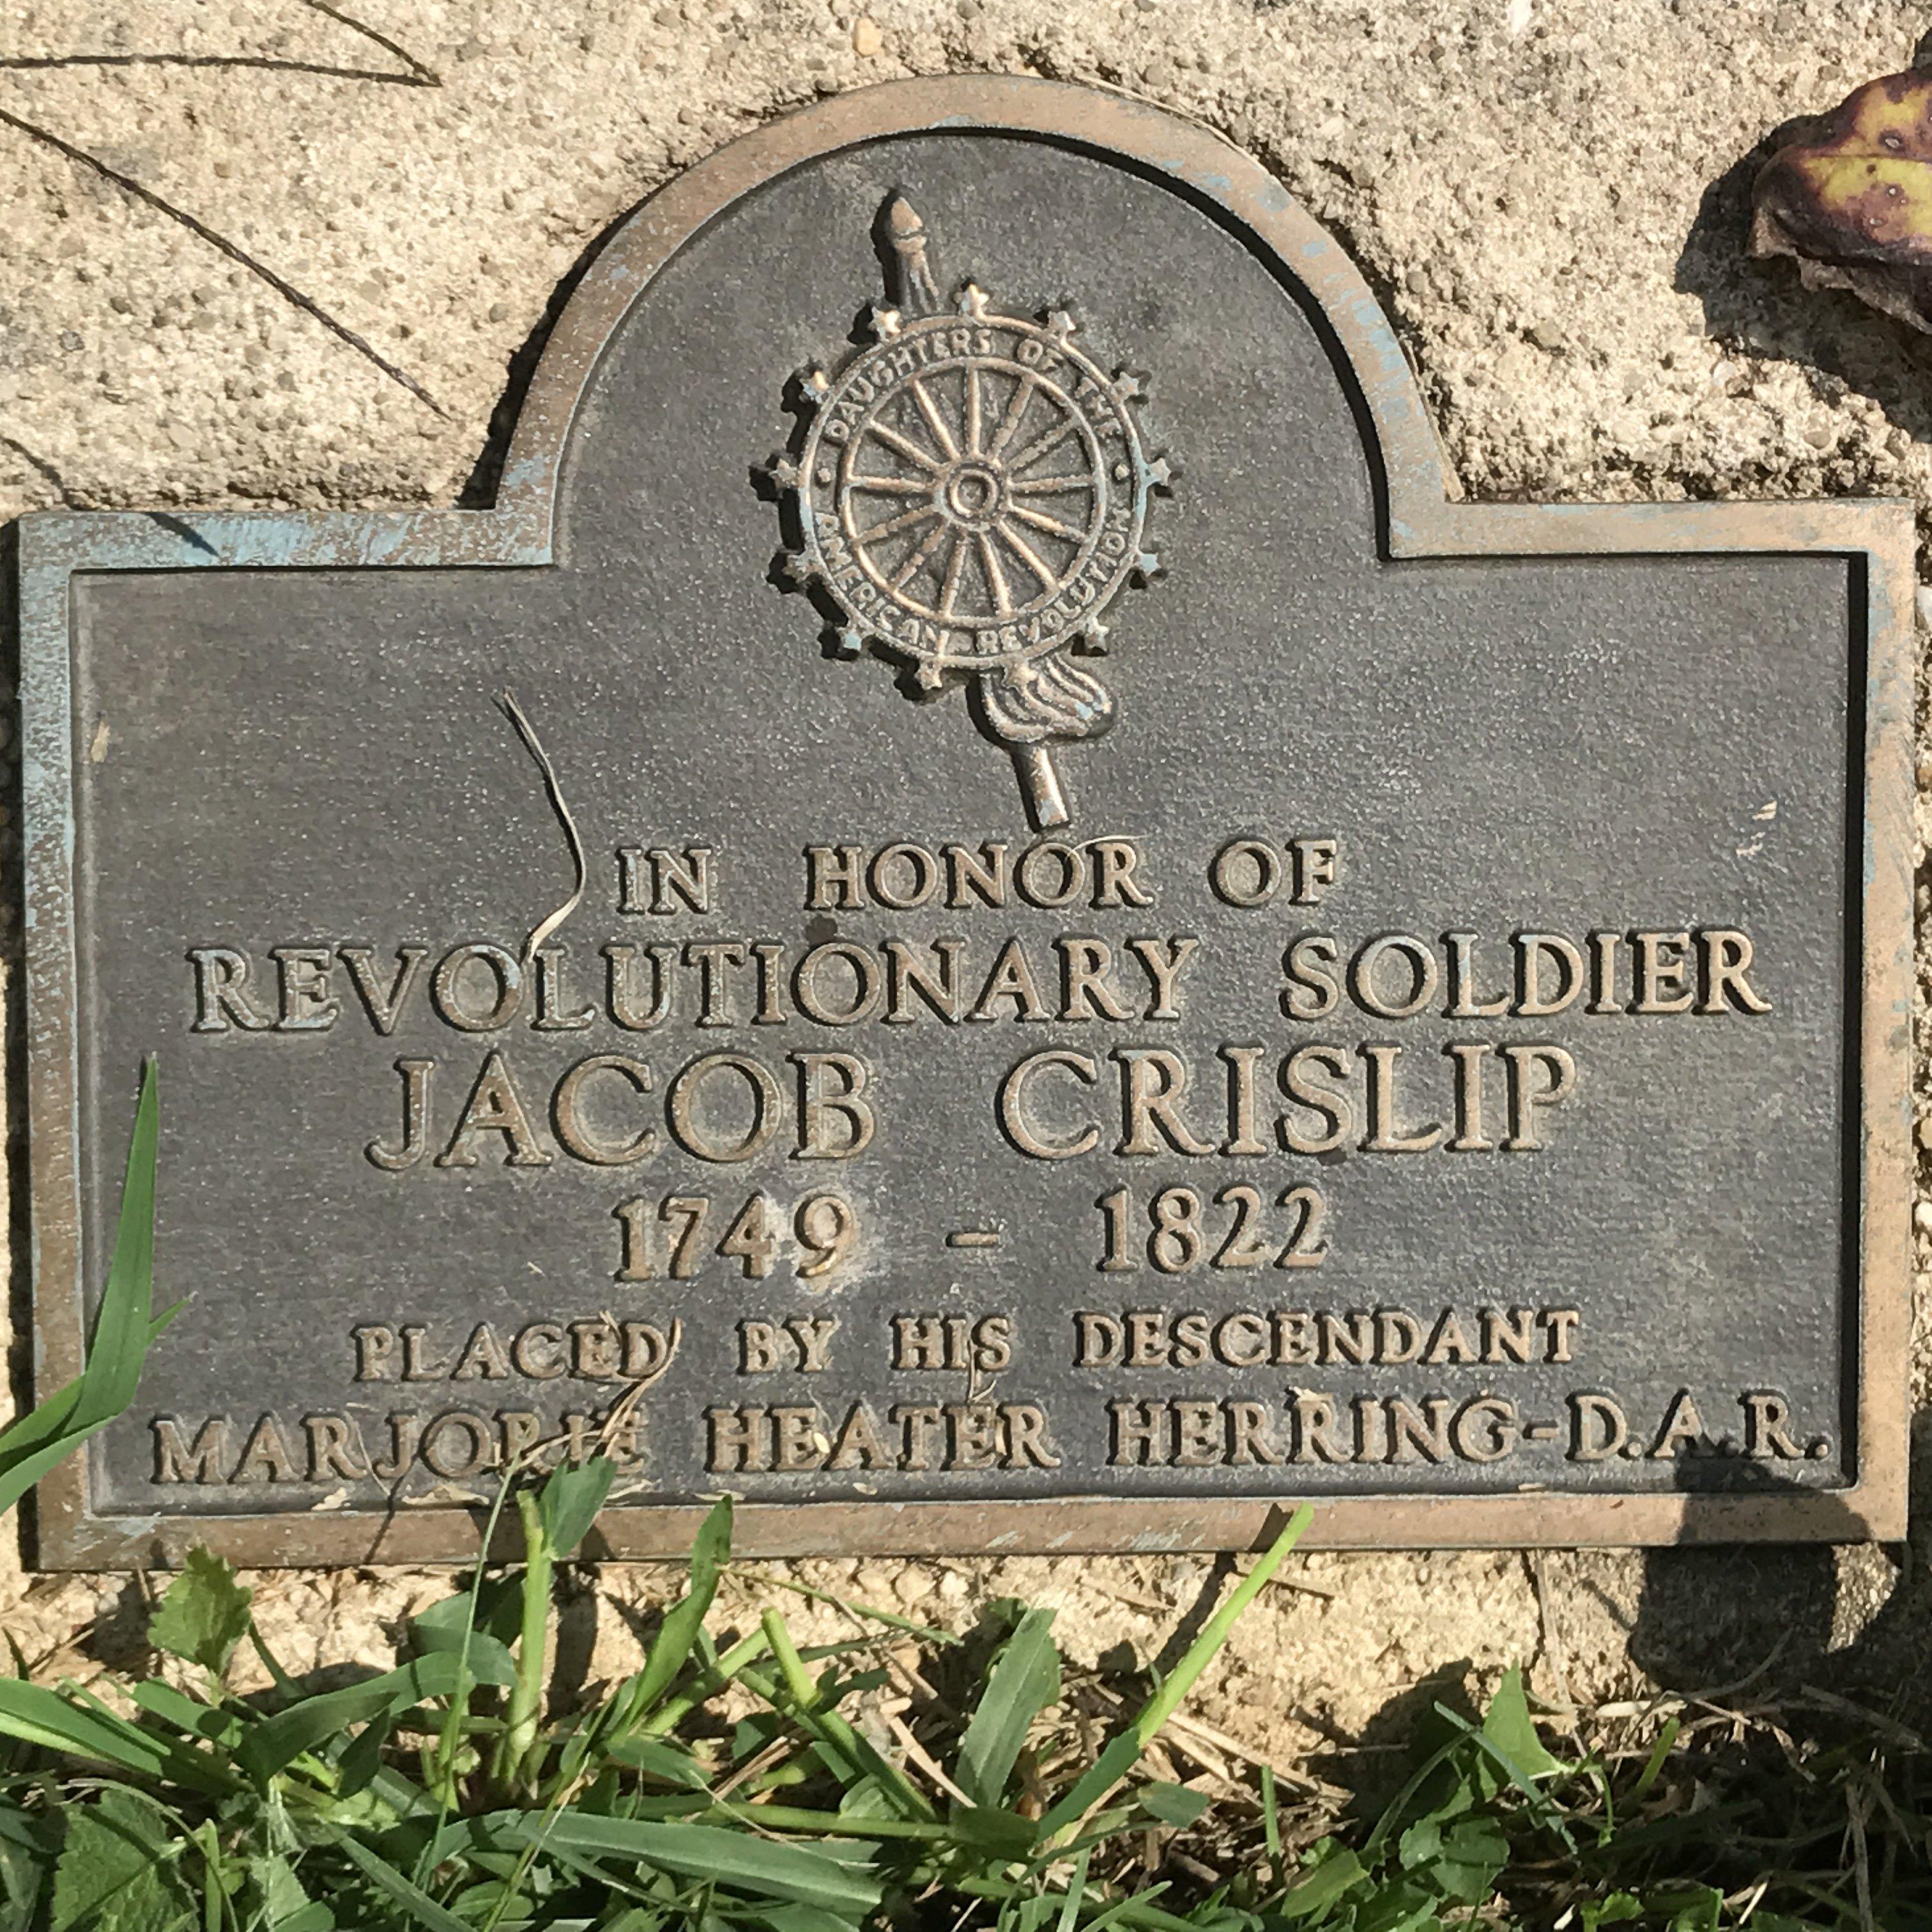 Memorial plaque for Jacob Chrislip (Crislip) at gravesite